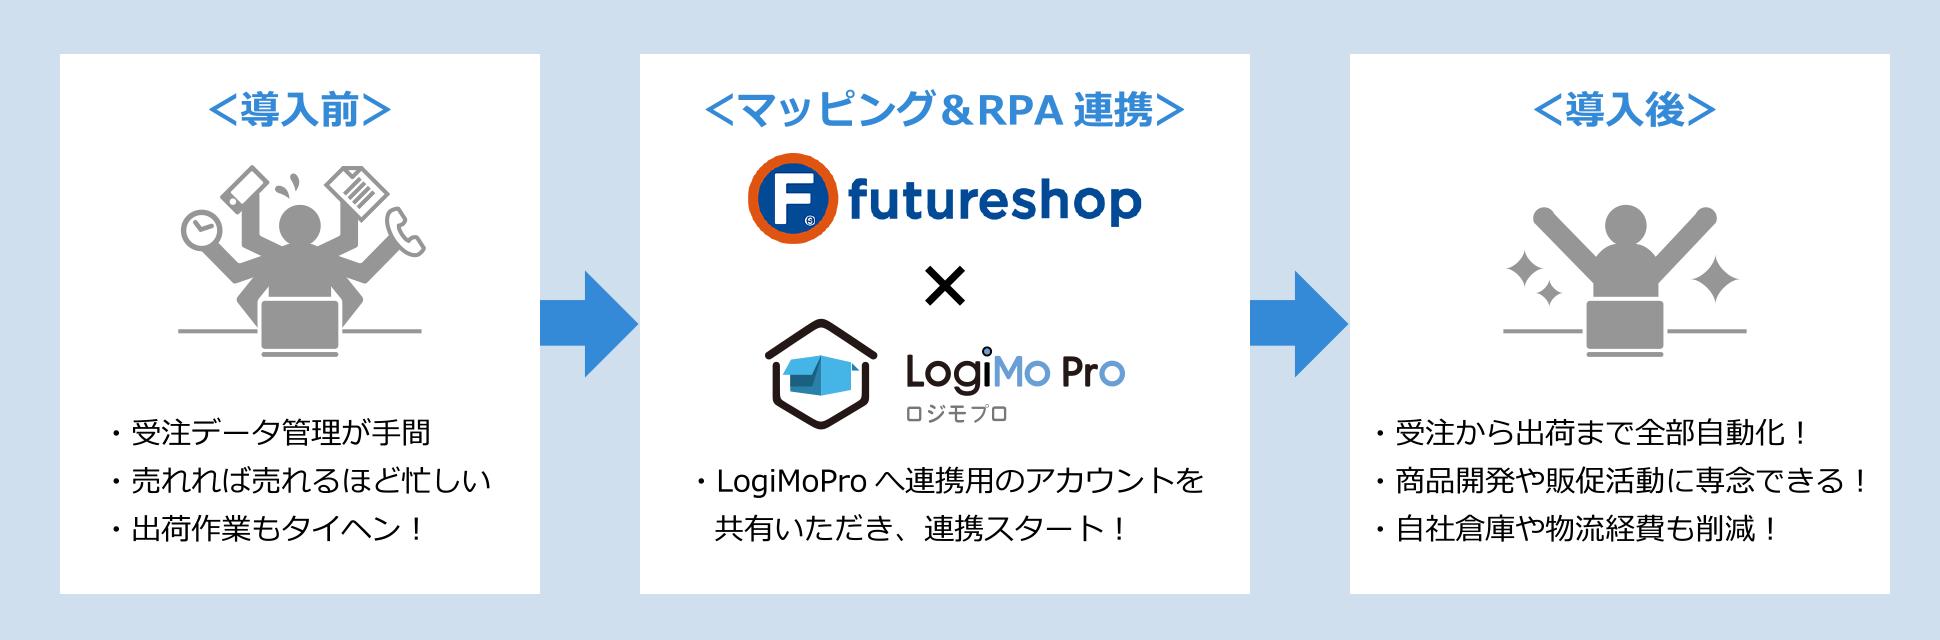 futureshop_logimopro_3step